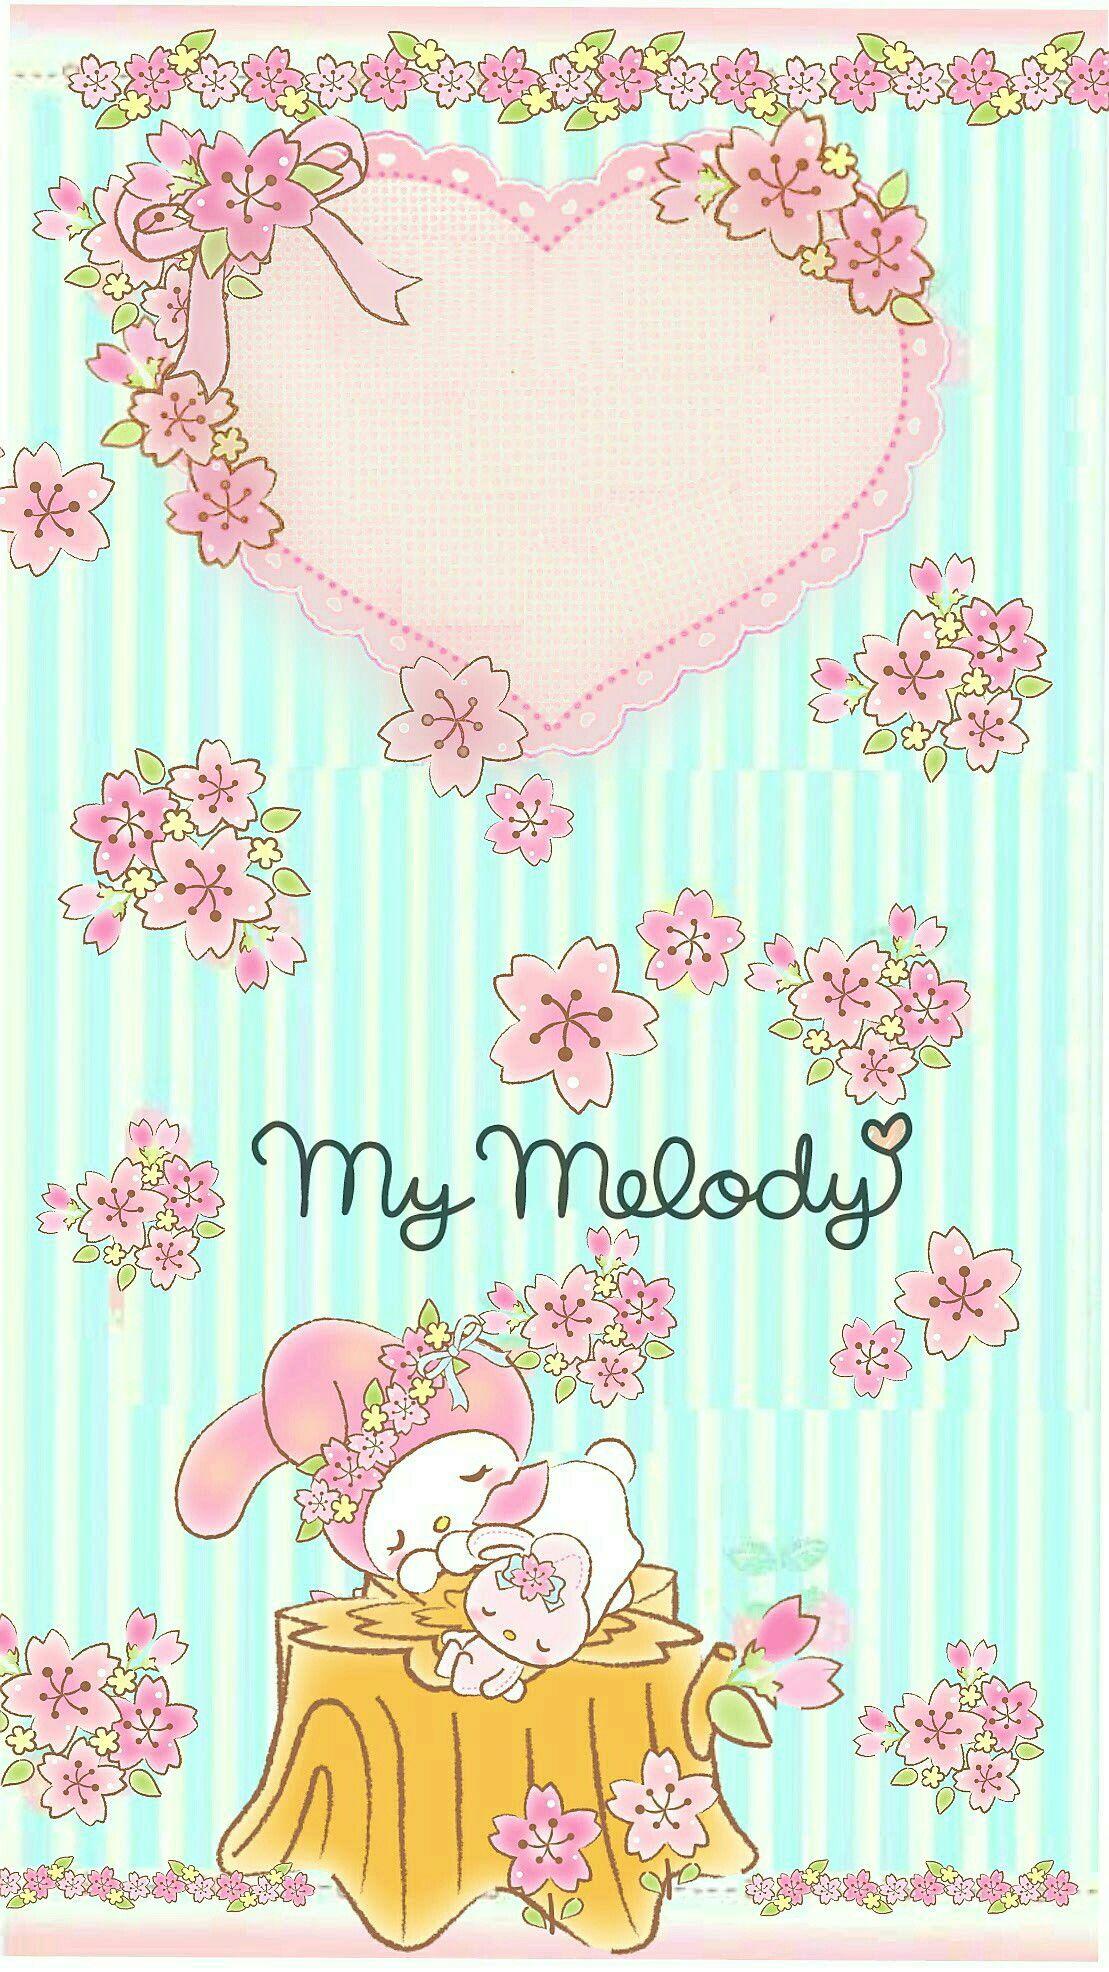 Popular Wallpaper Hello Kitty Vintage - 28df562faa4e5283b82020311b0fc39e  Image_80713.jpg